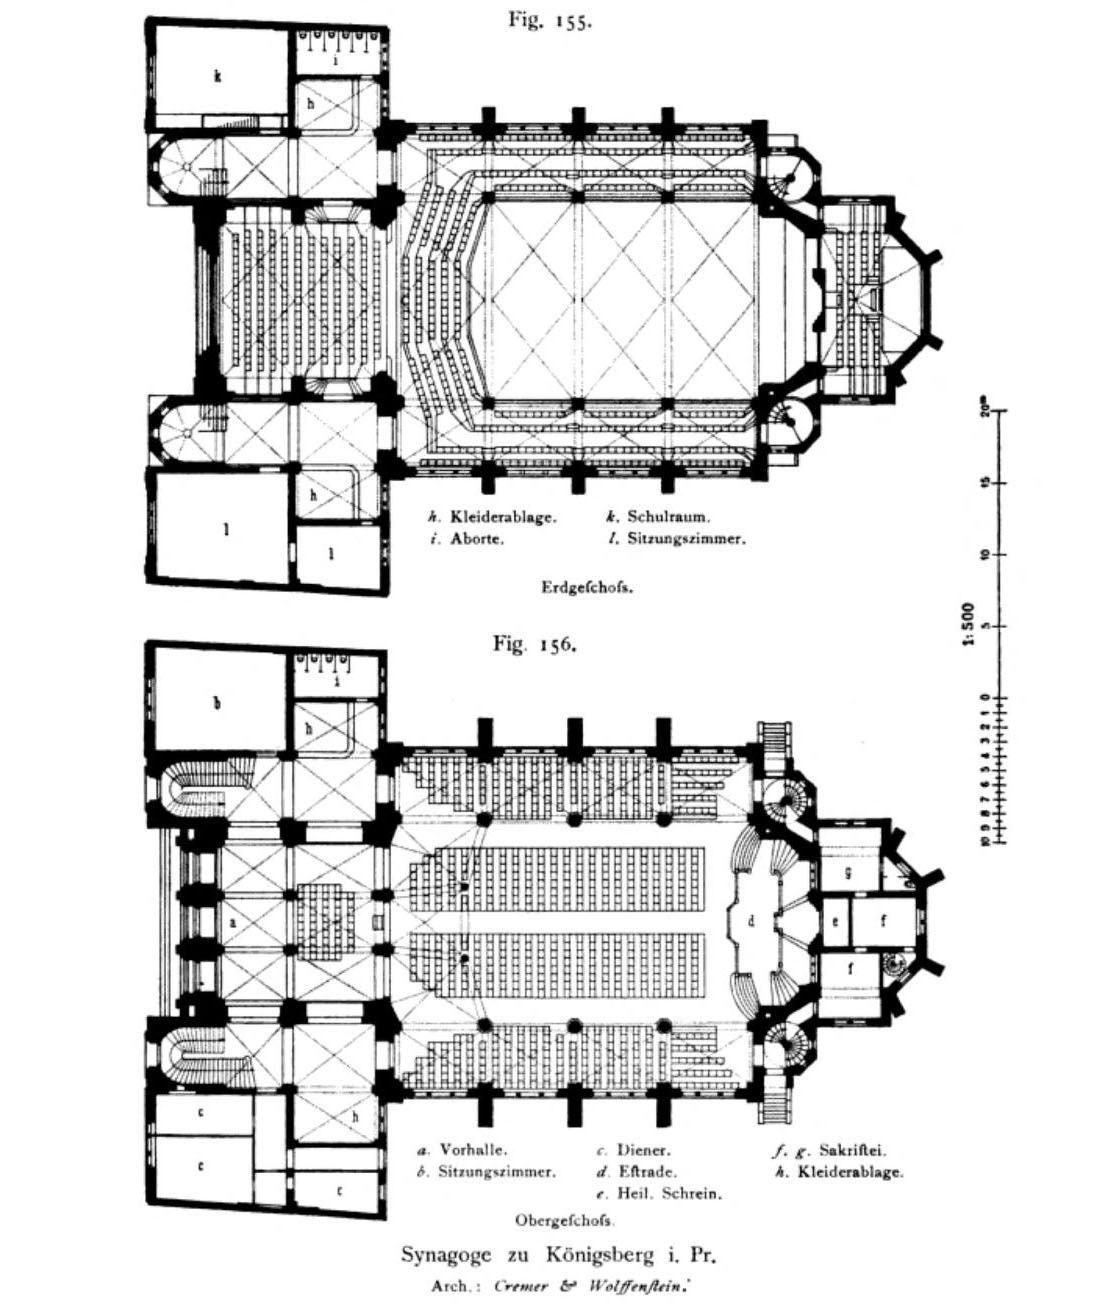 Floor Plans Of The Synagogue Konigsberg